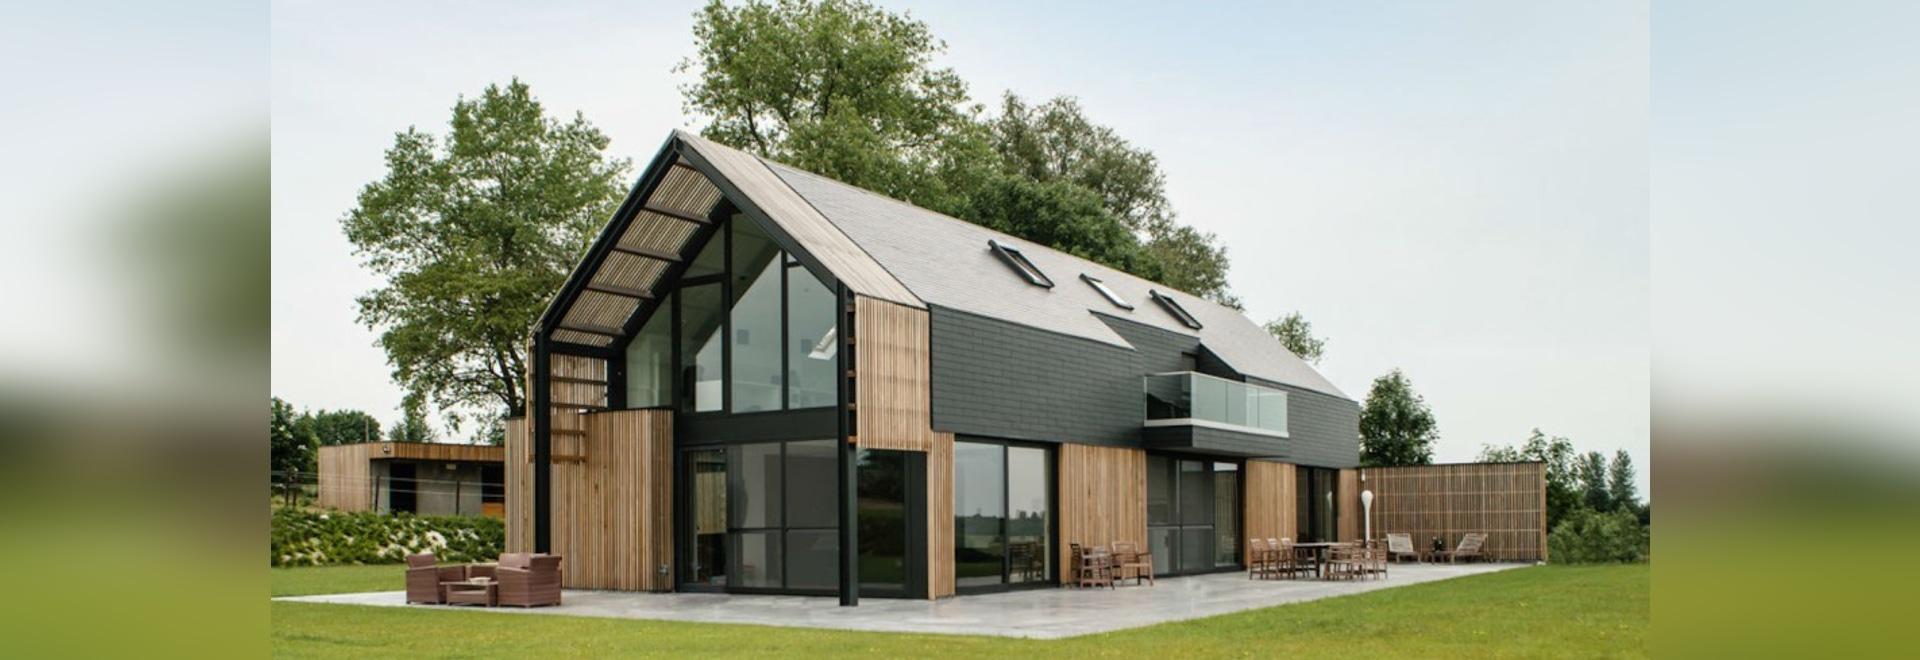 Stunning Maison Moderne Belgique Contemporary - Design Trends 2017 ...